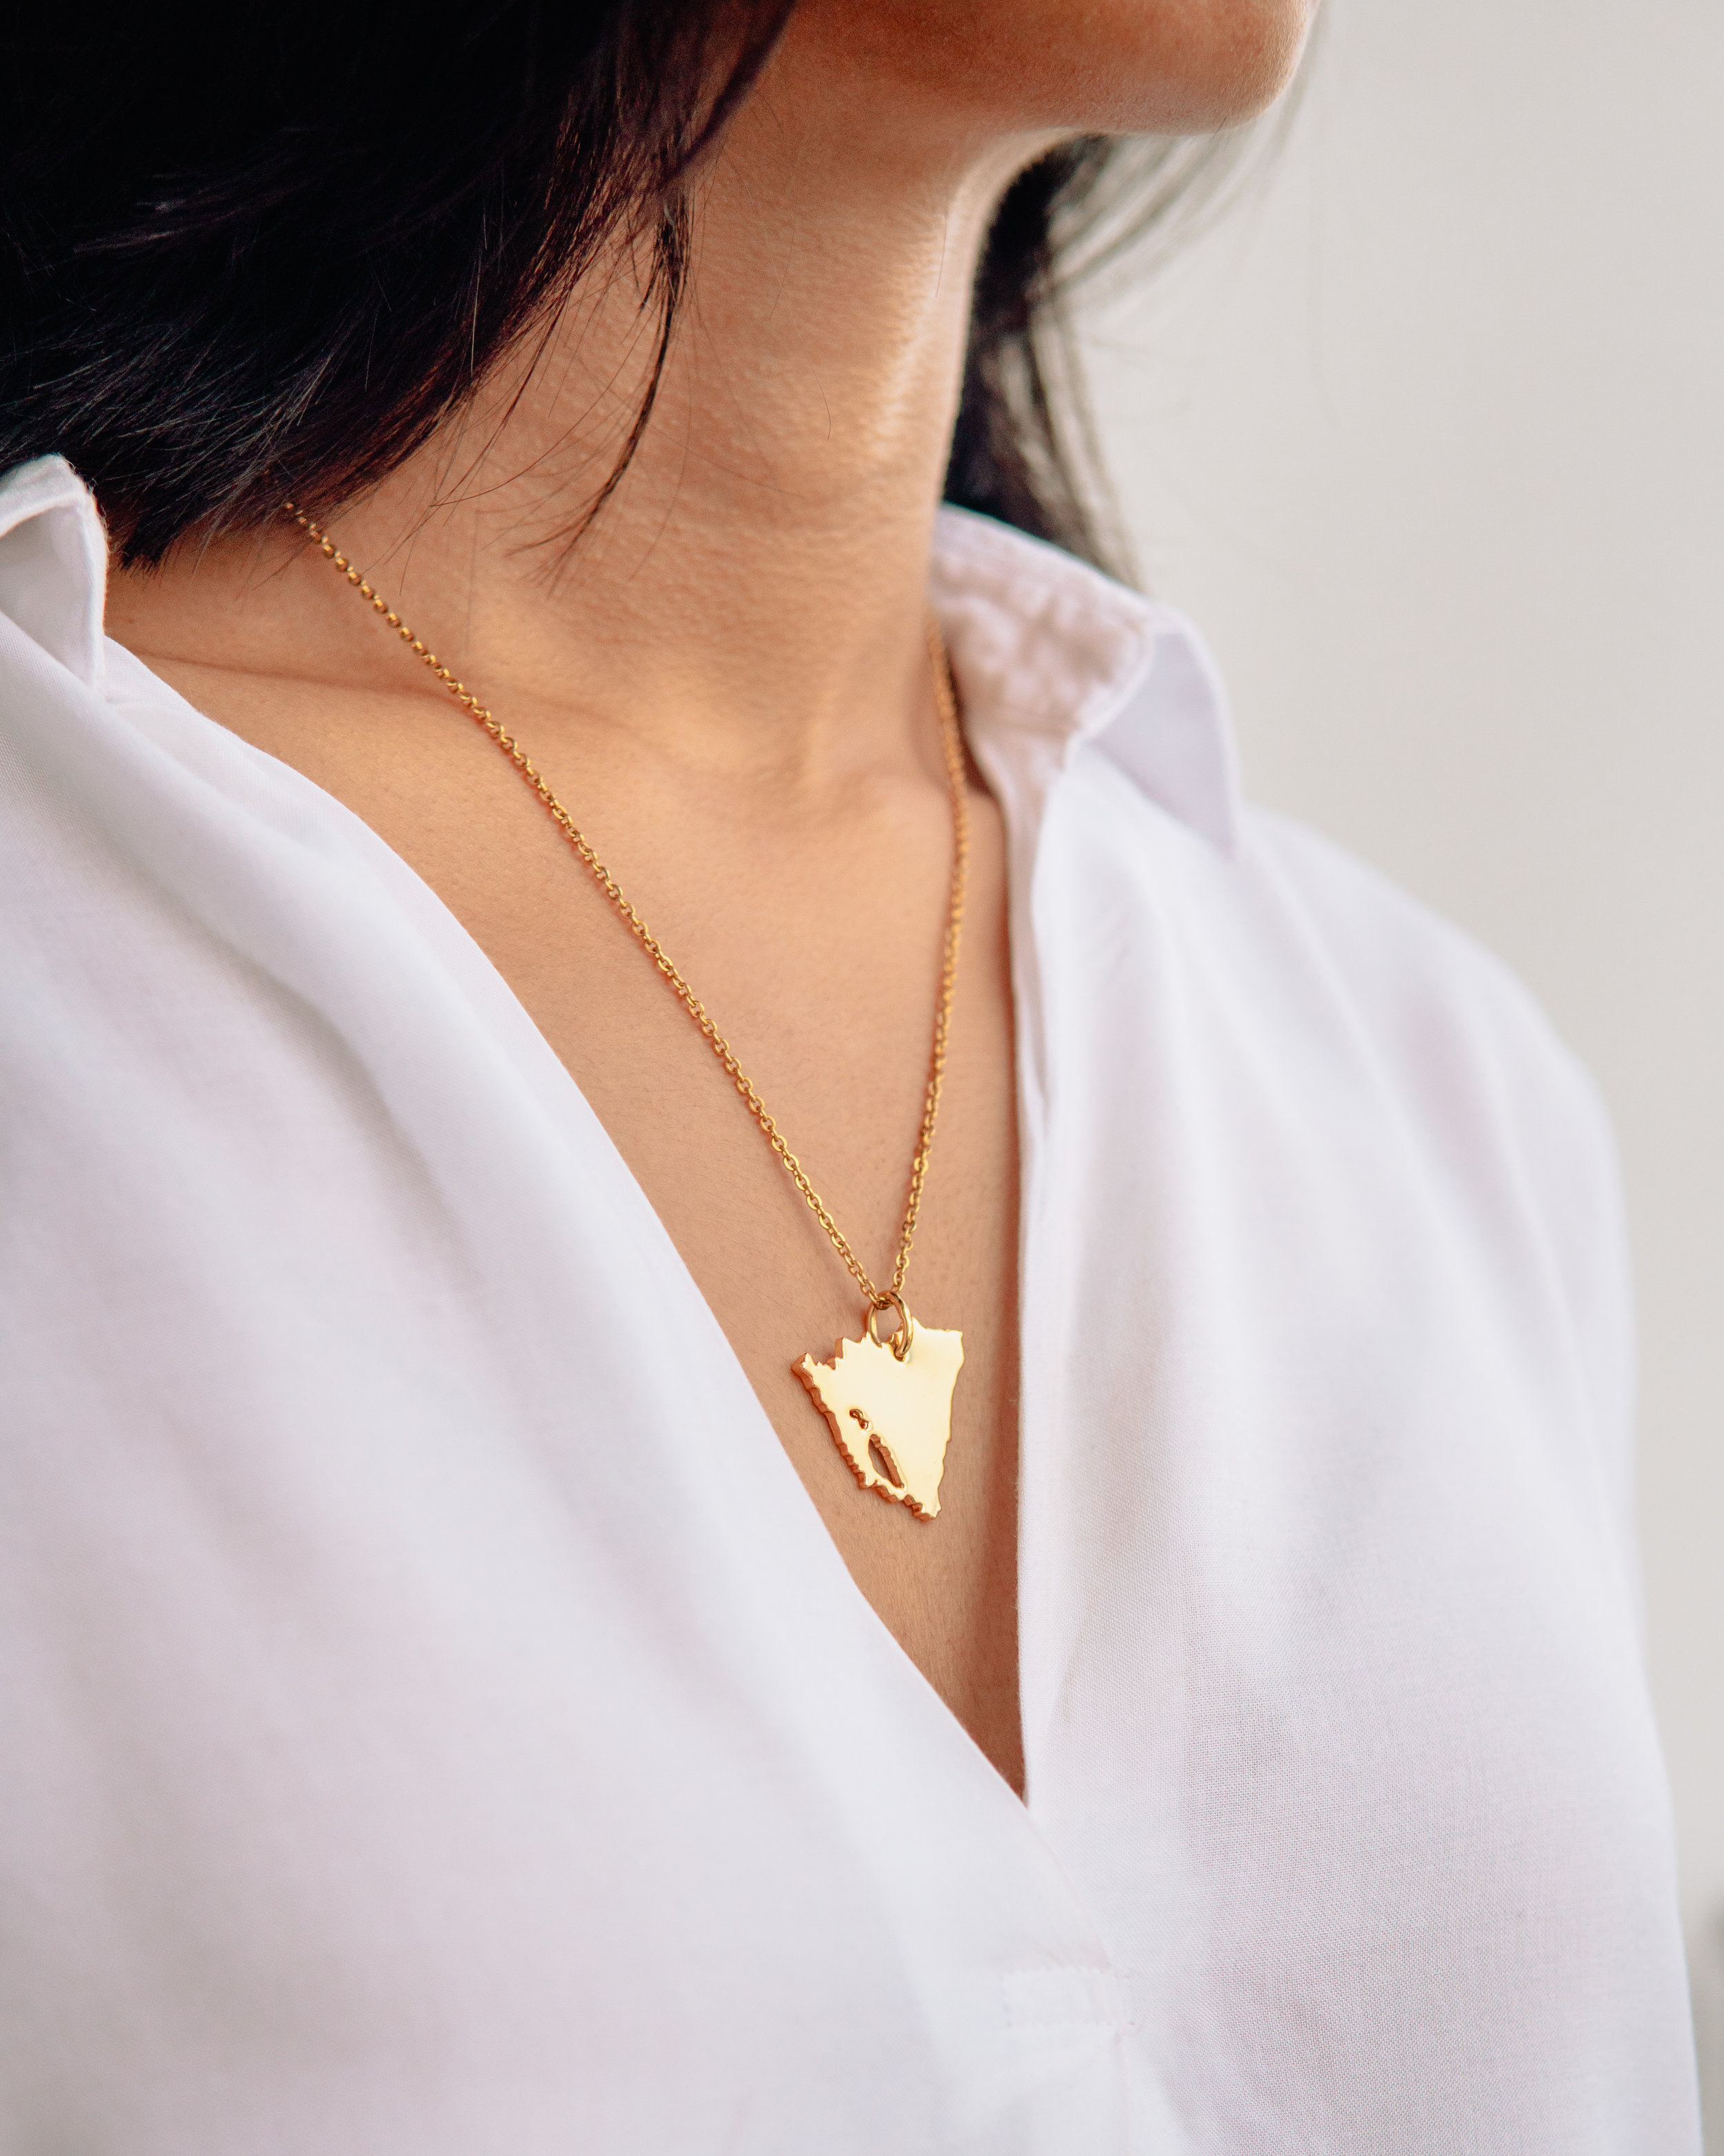 necklace-worn-nicaragua.jpg